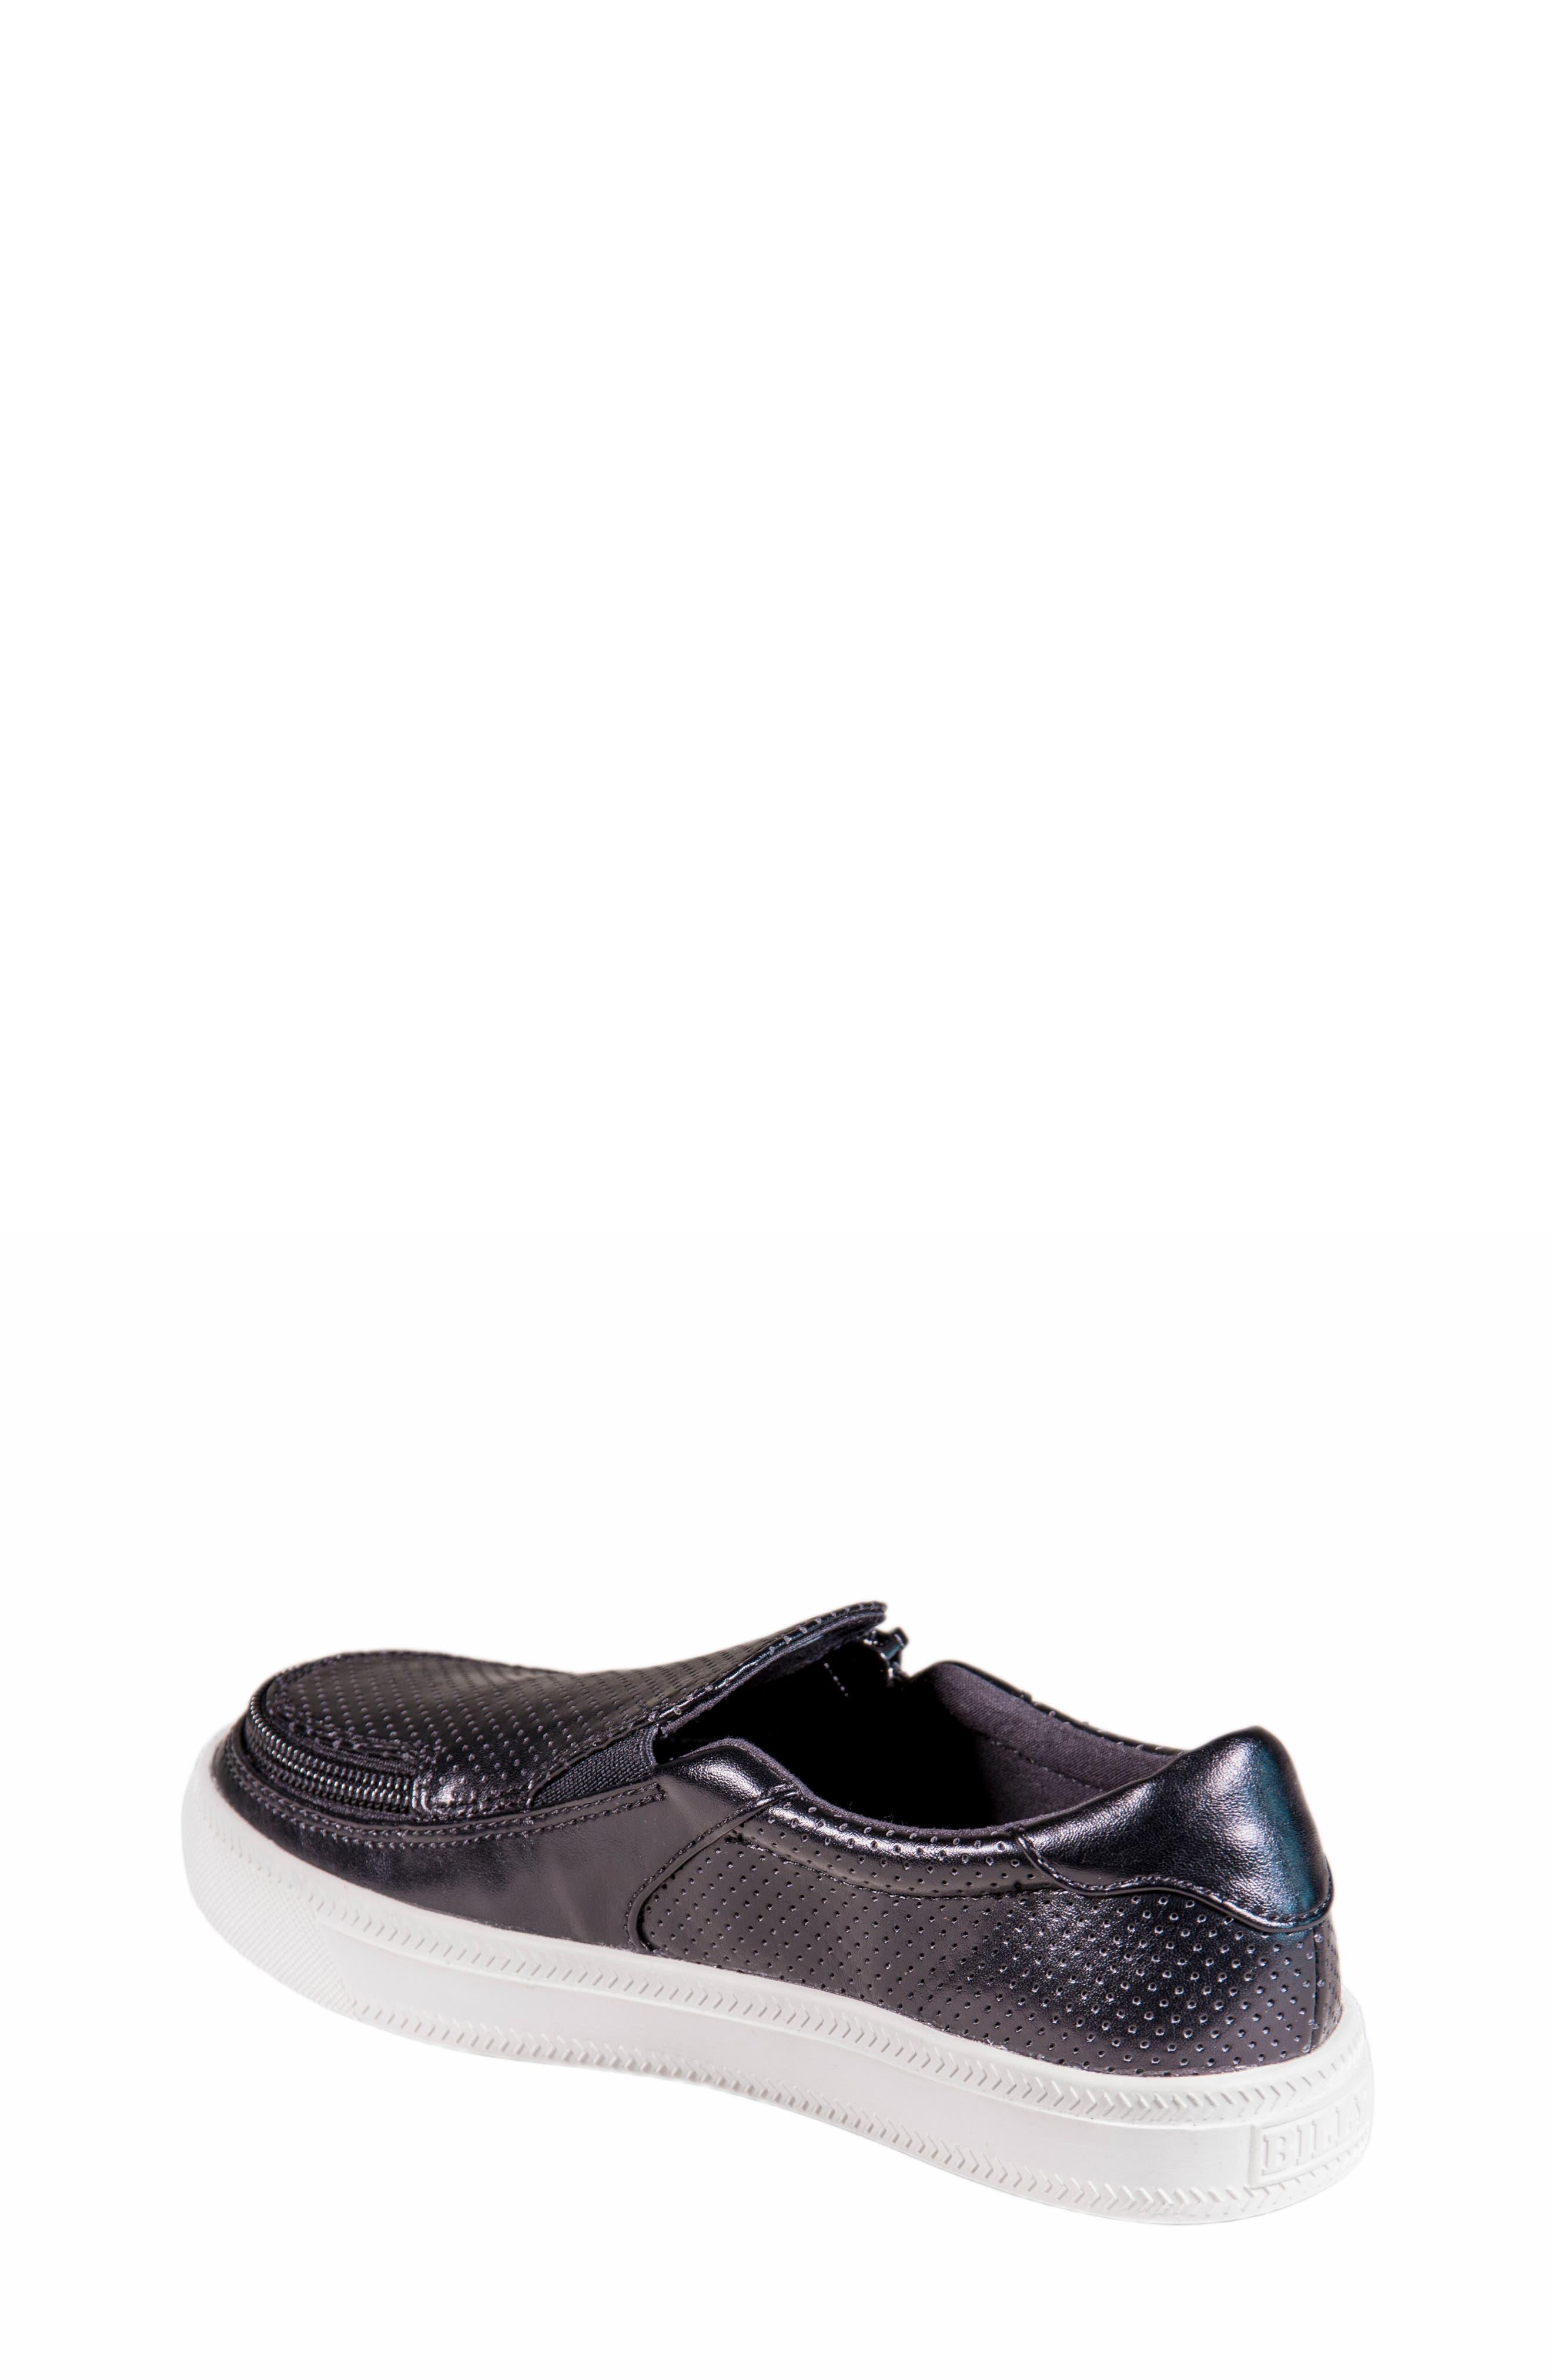 Zip Around Perforated Low Top Sneaker,                             Alternate thumbnail 3, color,